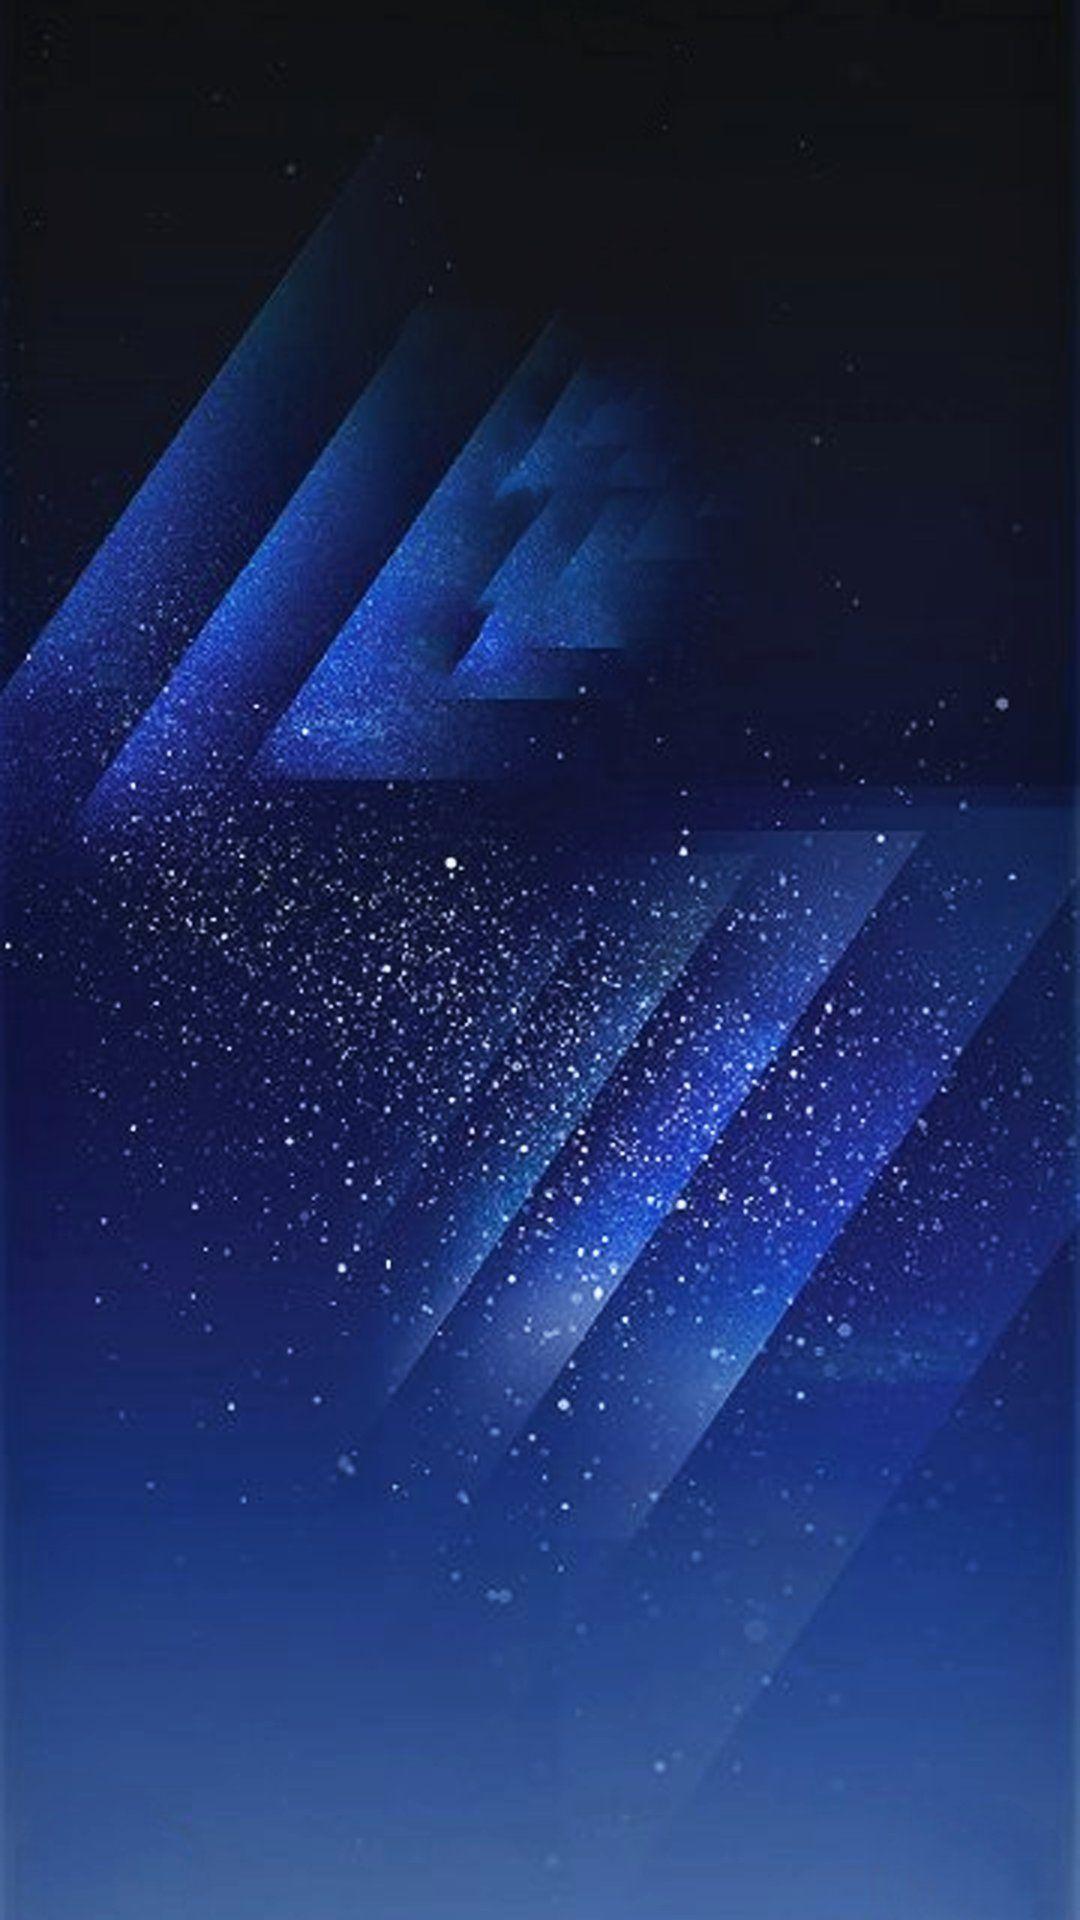 Samsung Wallpapers 2018 Hd Babangrichie Org